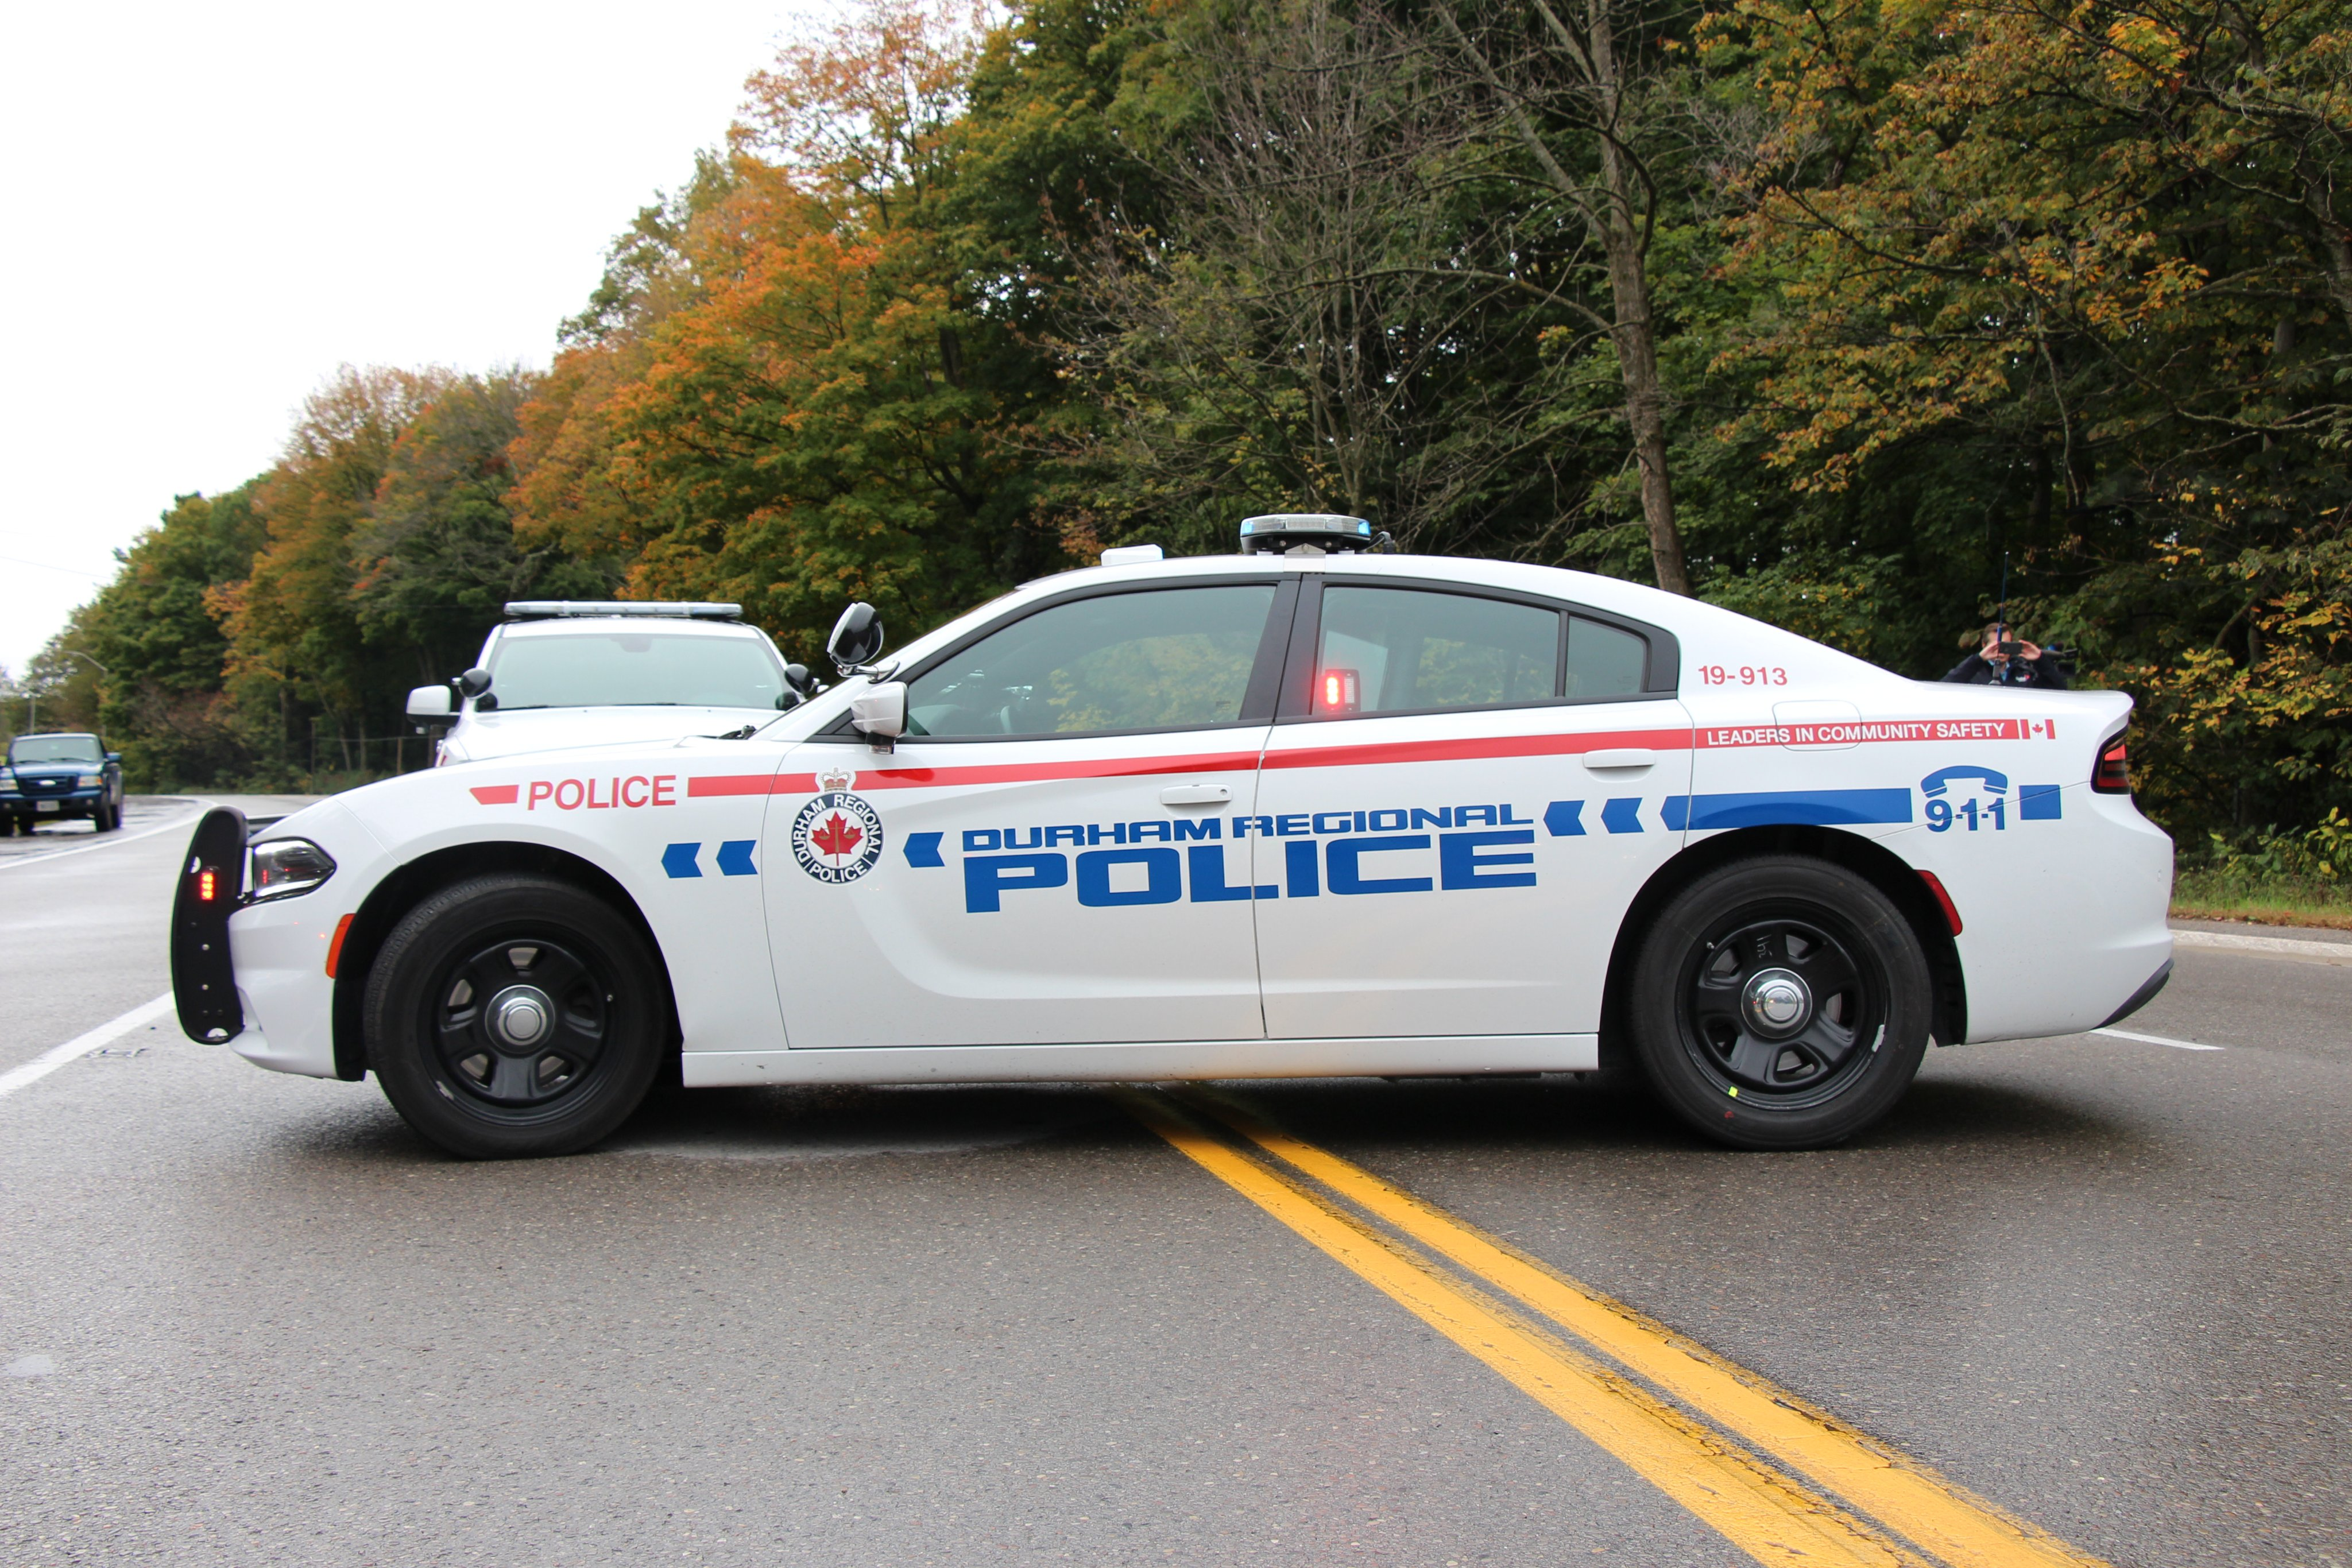 Police investigating serious collision in Uxbridge